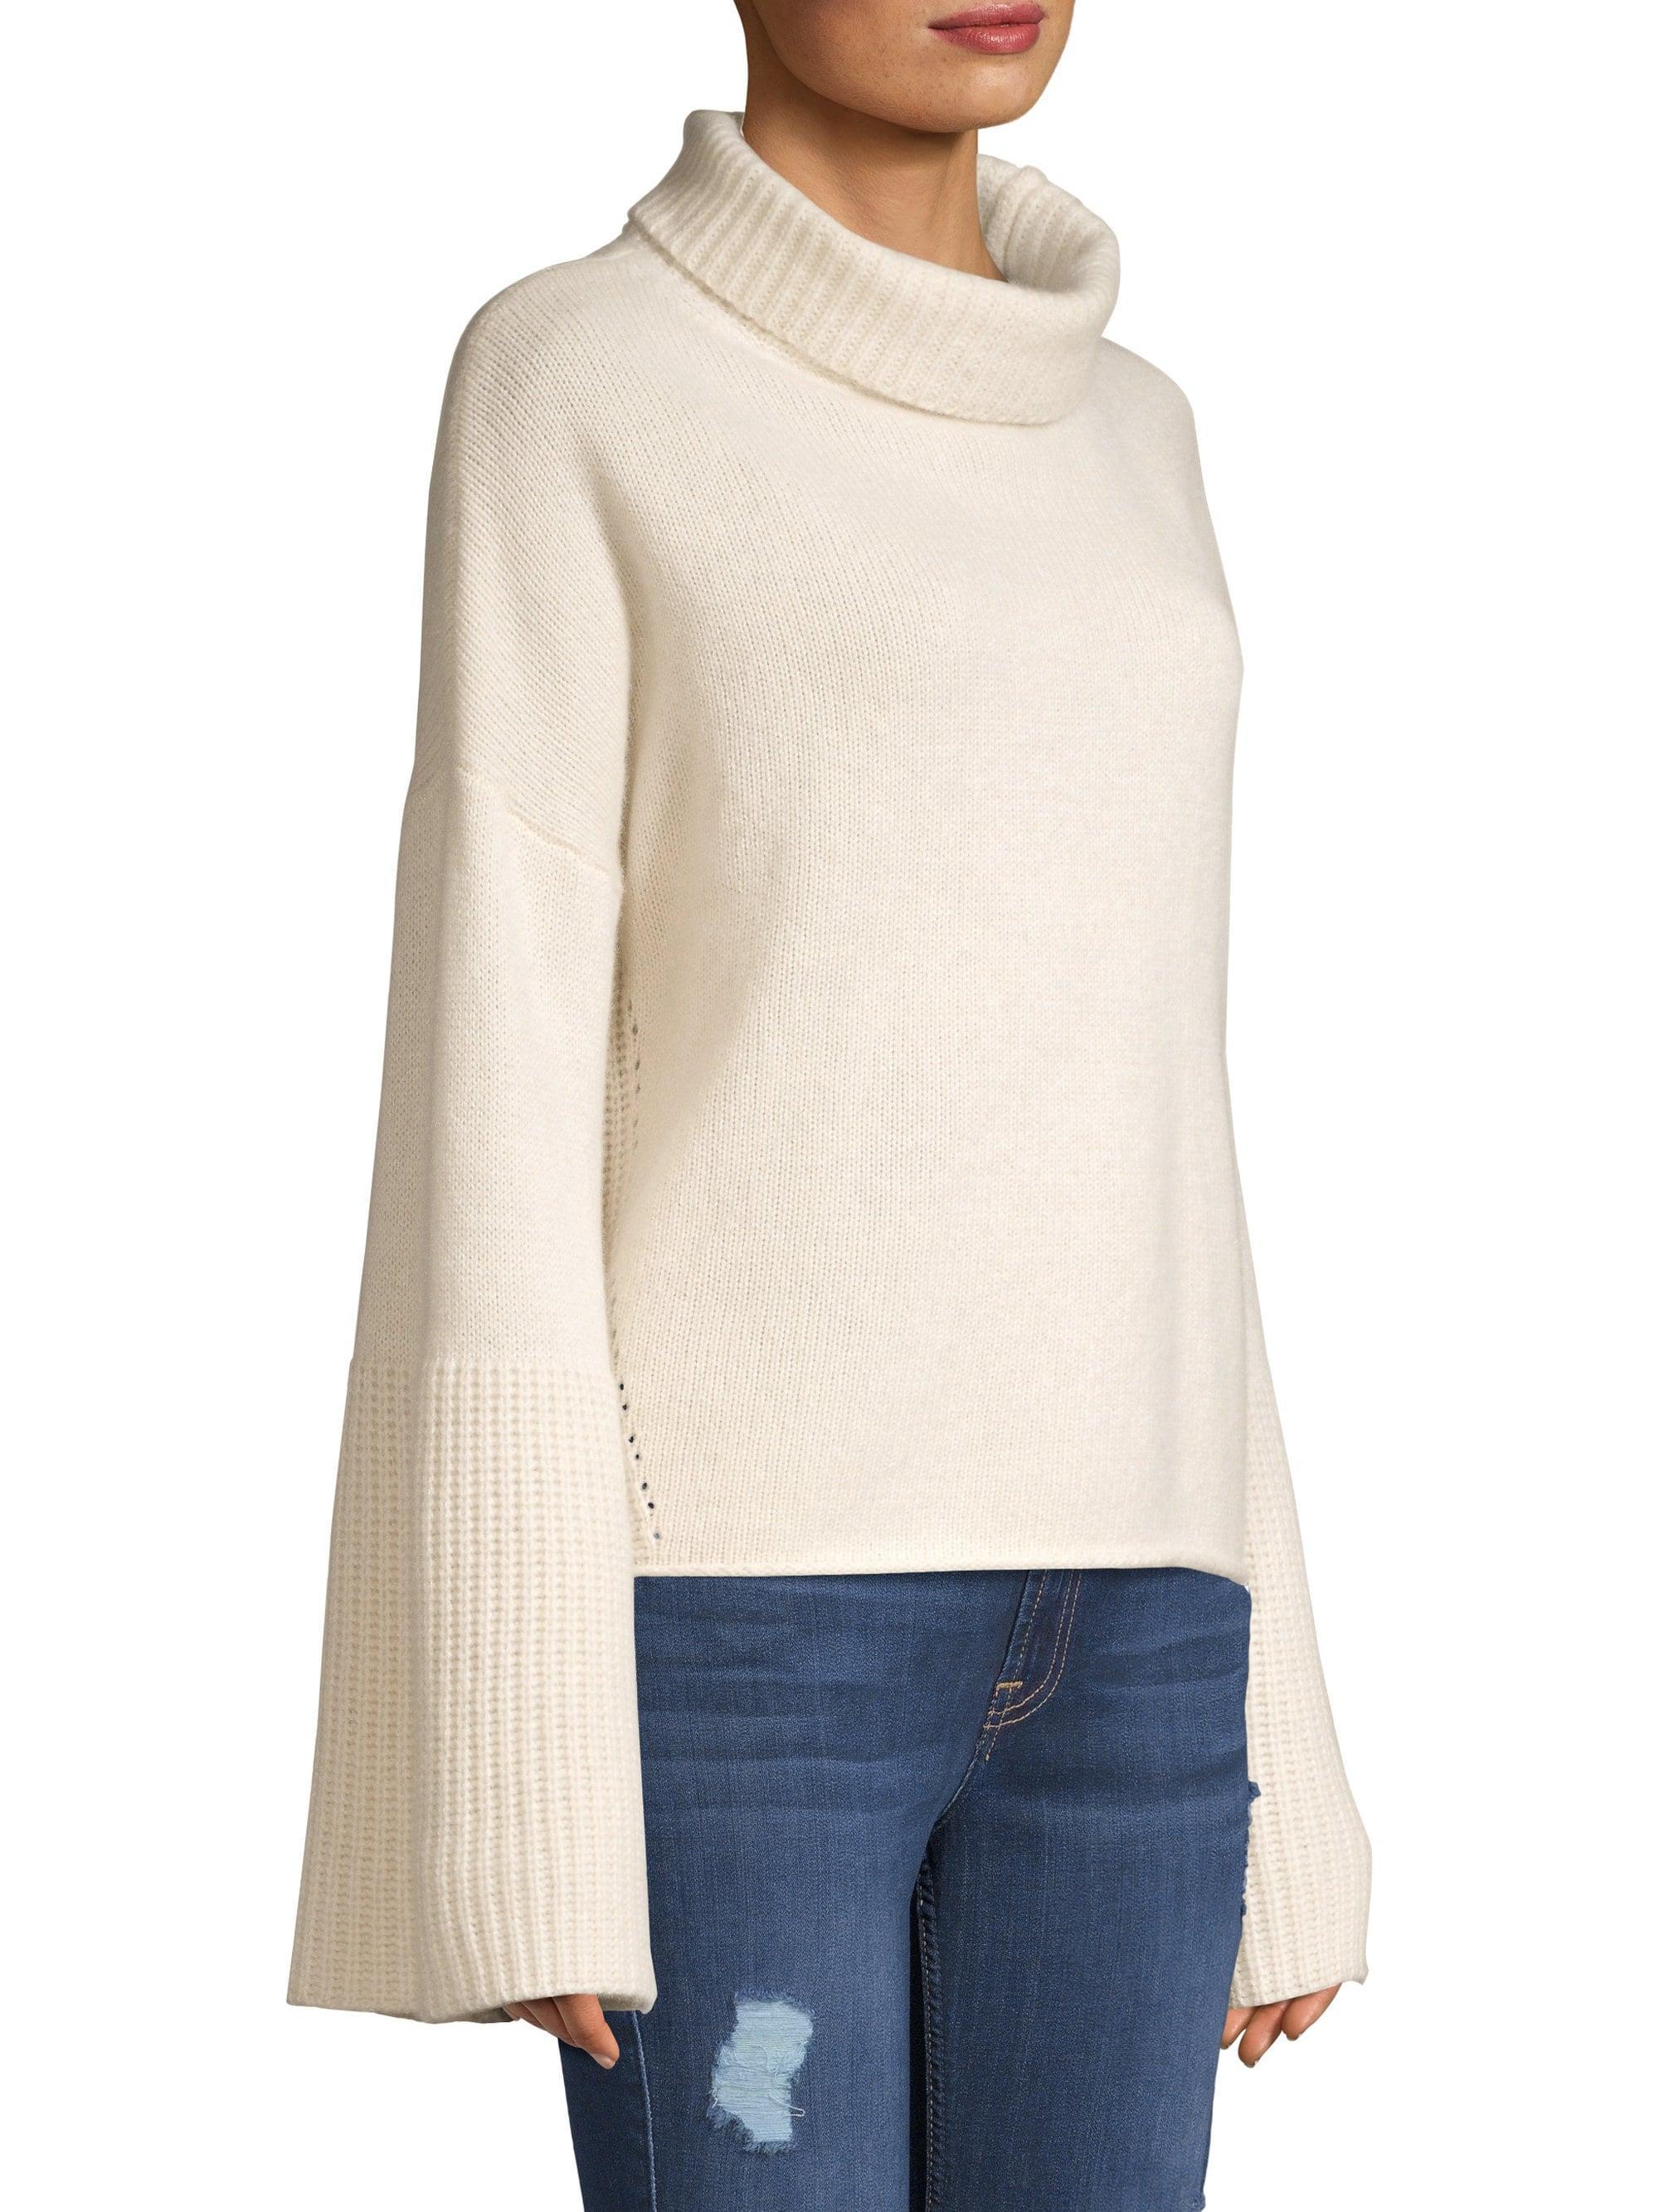 a031dc4b516 360cashmere Lulu Bell Sleeve Turtleneck Sweater - Lyst